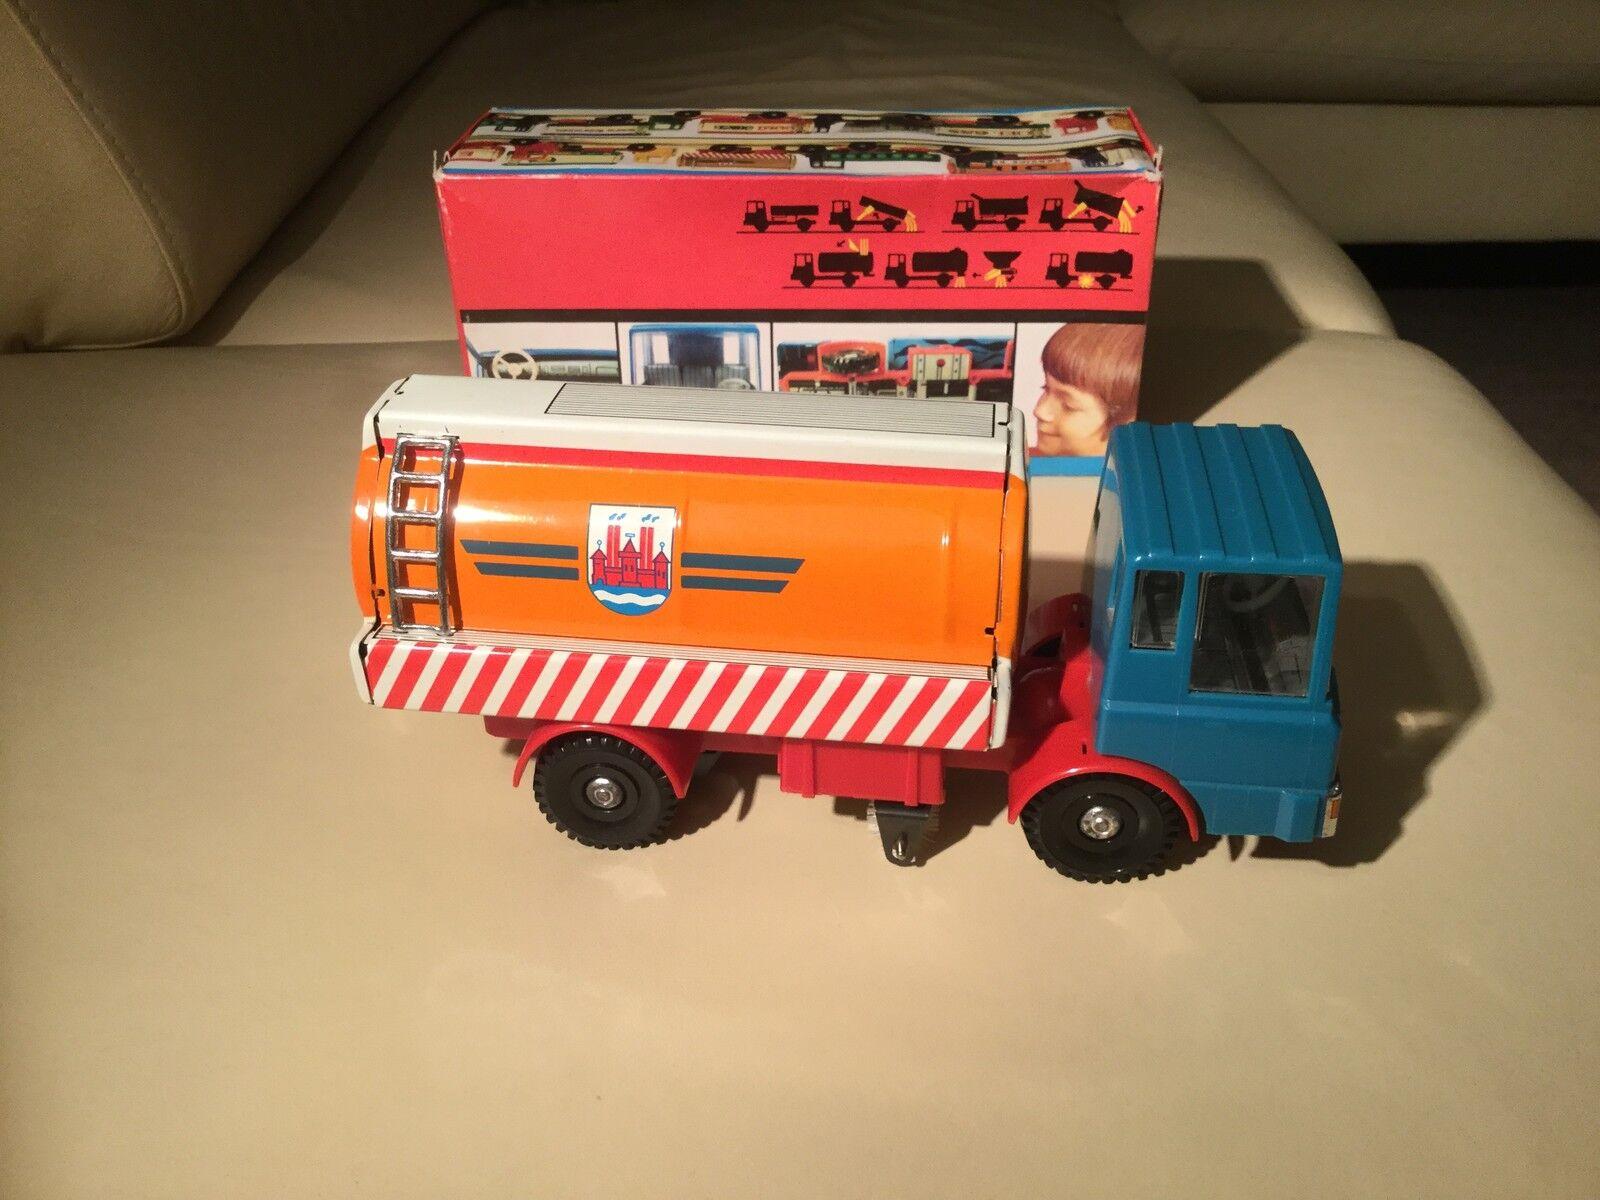 Original kehrwagen Weimar 2062 tôle jouets RDA  vintage de collection rare  sortie d'exportation